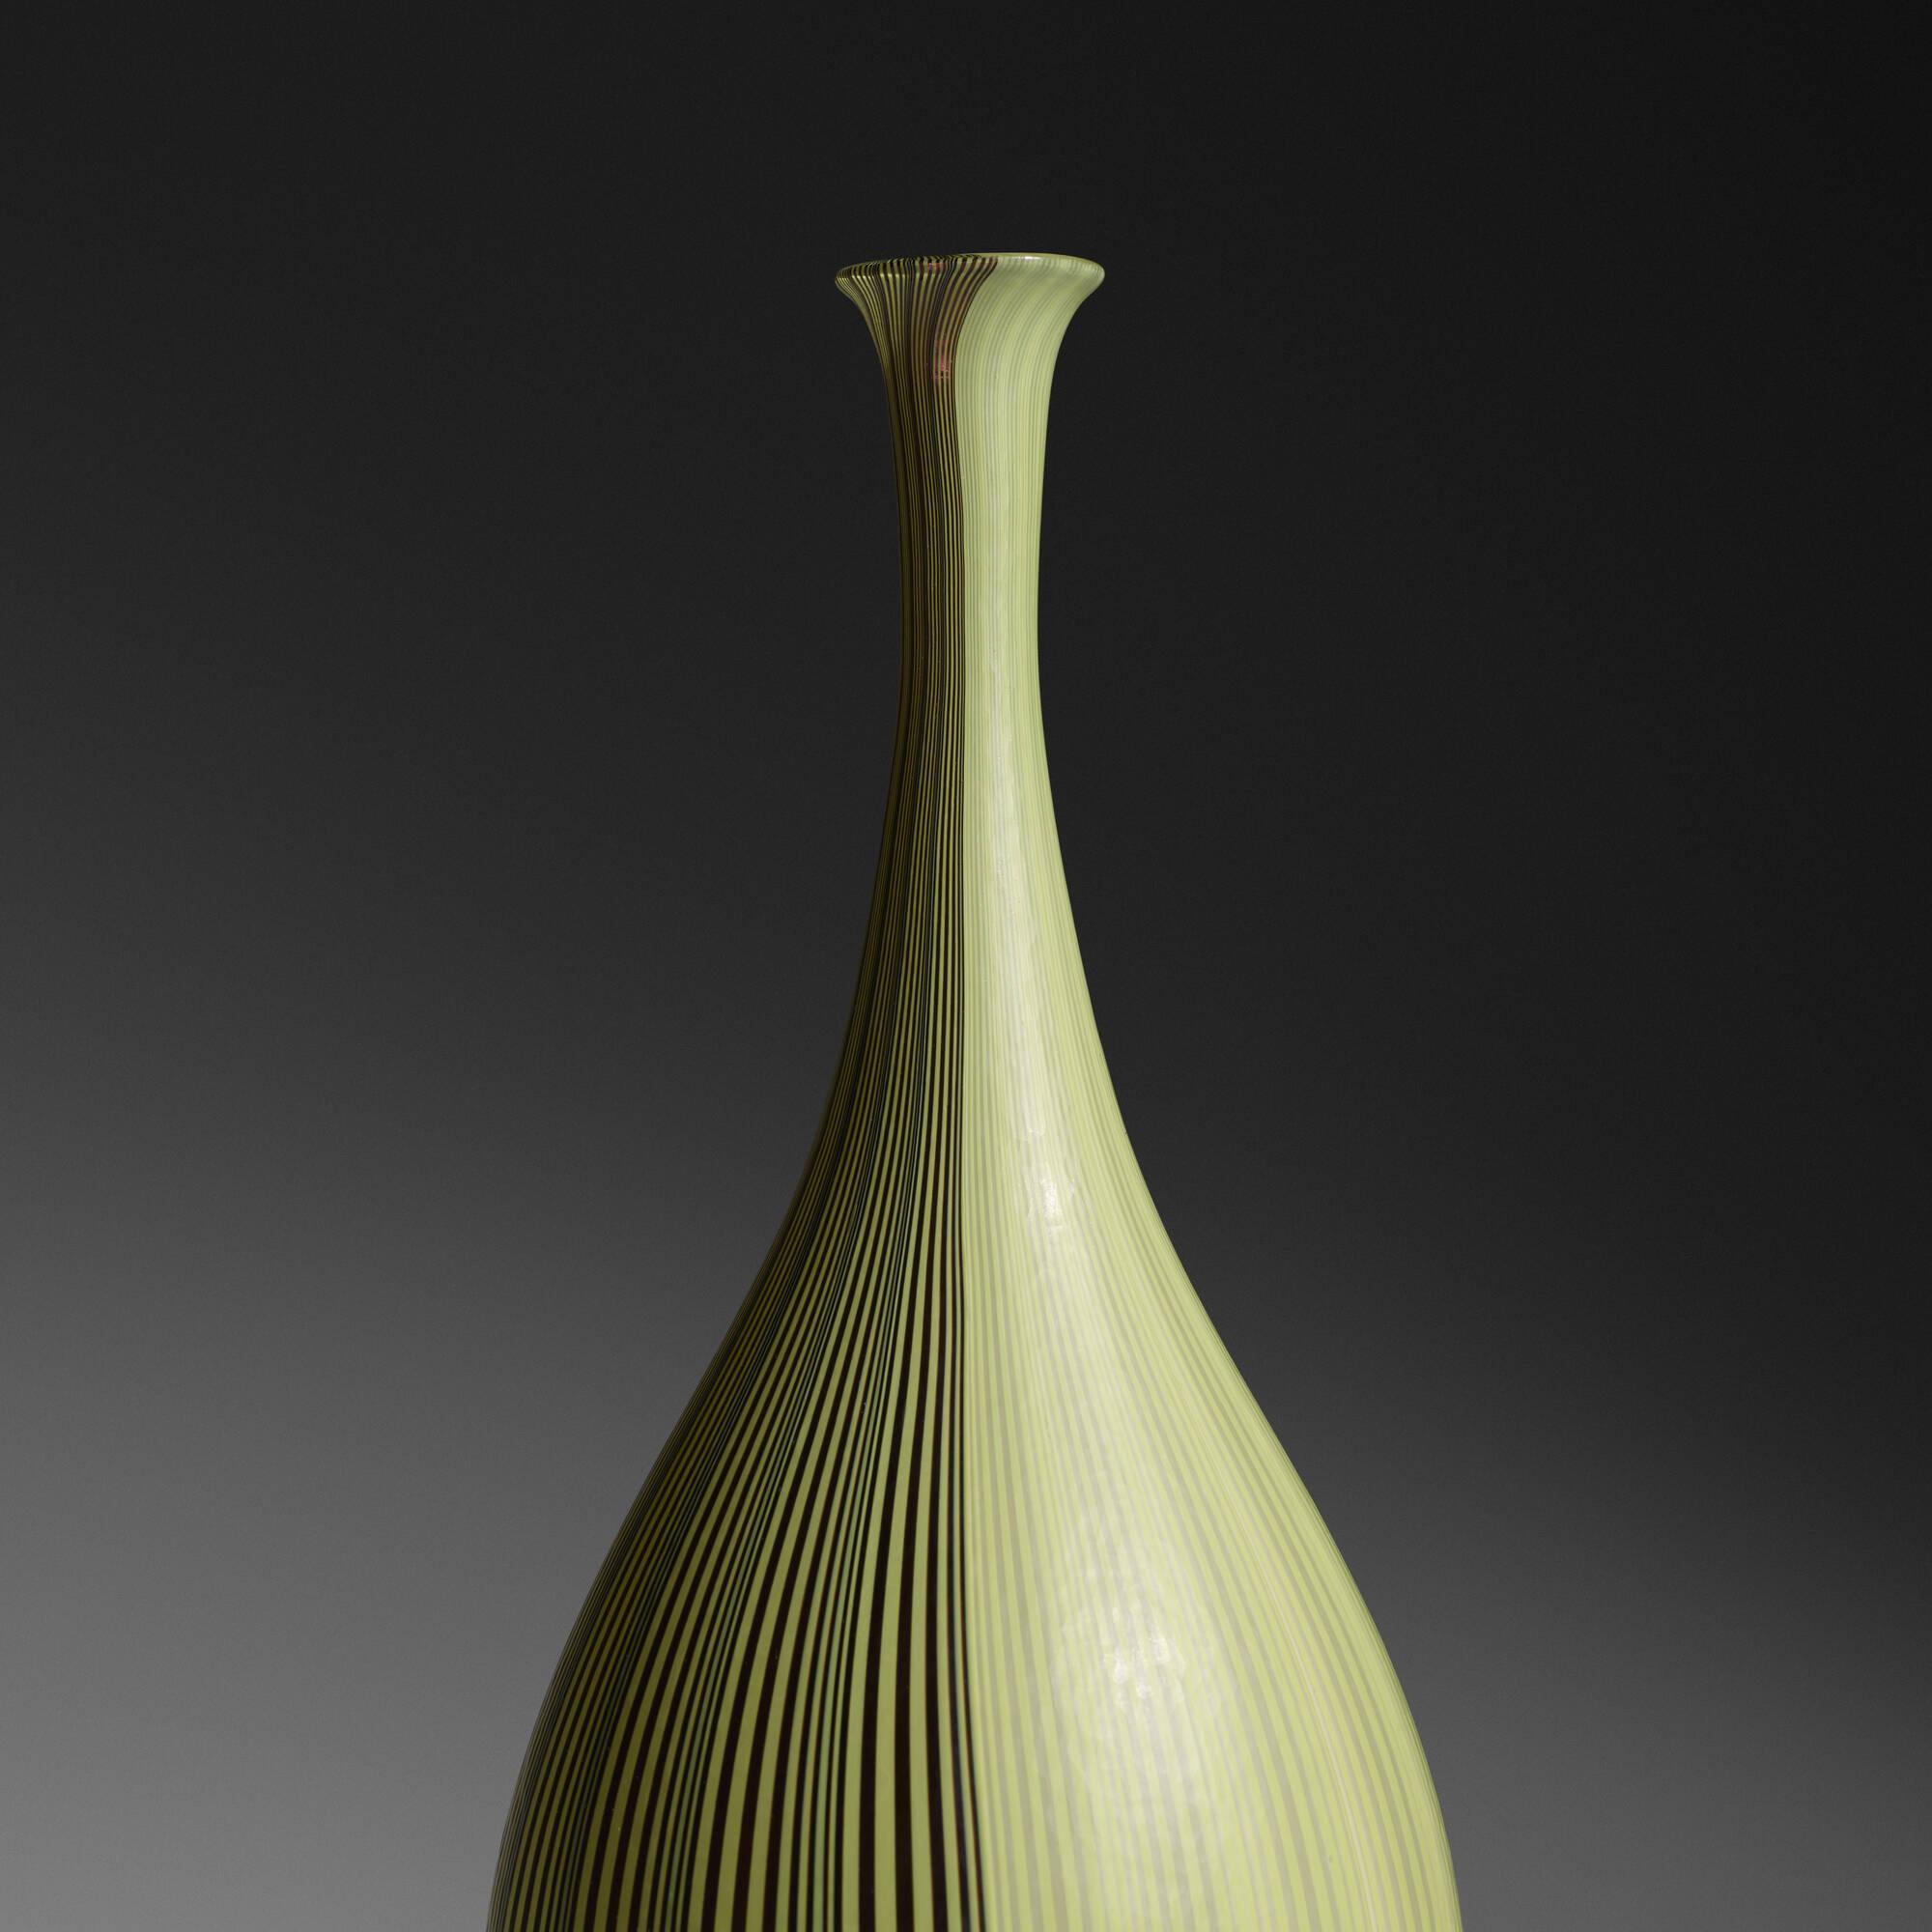 45 carlo scarpa tessuto vase model 3900 masterworks 21 45 carlo scarpa tessuto vase model 3900 2 of 3 floridaeventfo Image collections